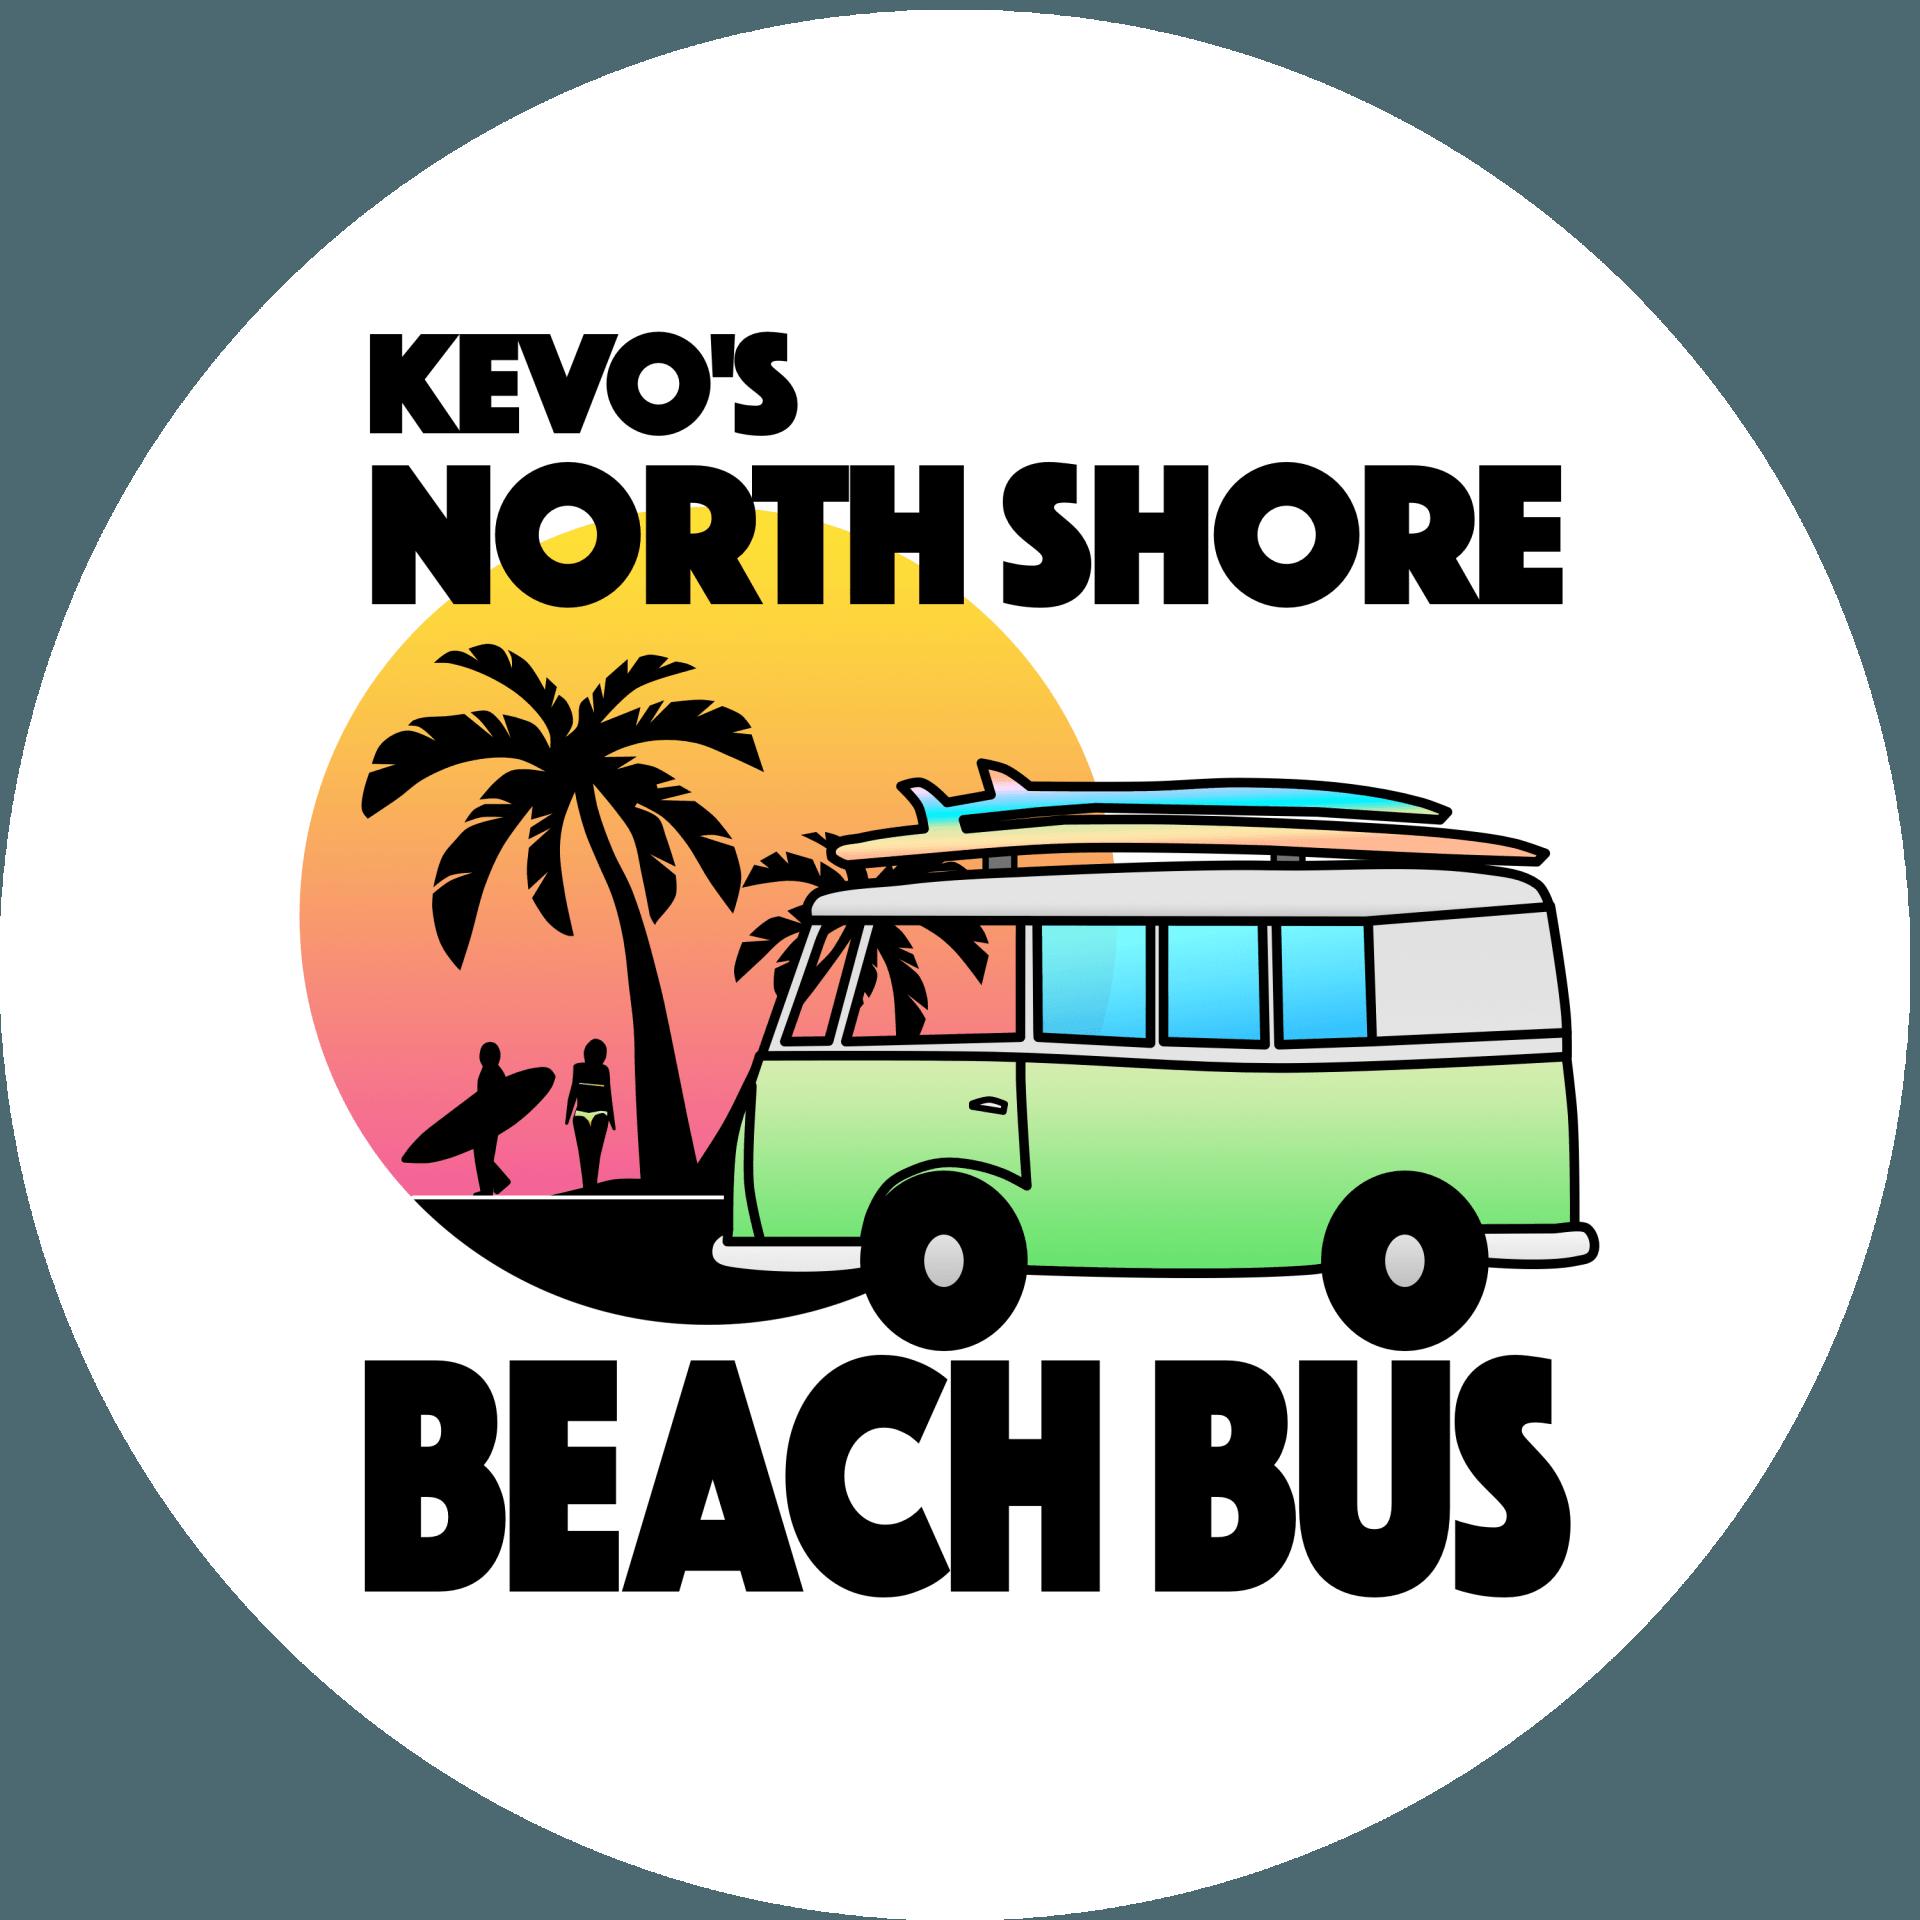 1 North Shore Tour on Oahu, Hawaii | Kevo's Beach Bus